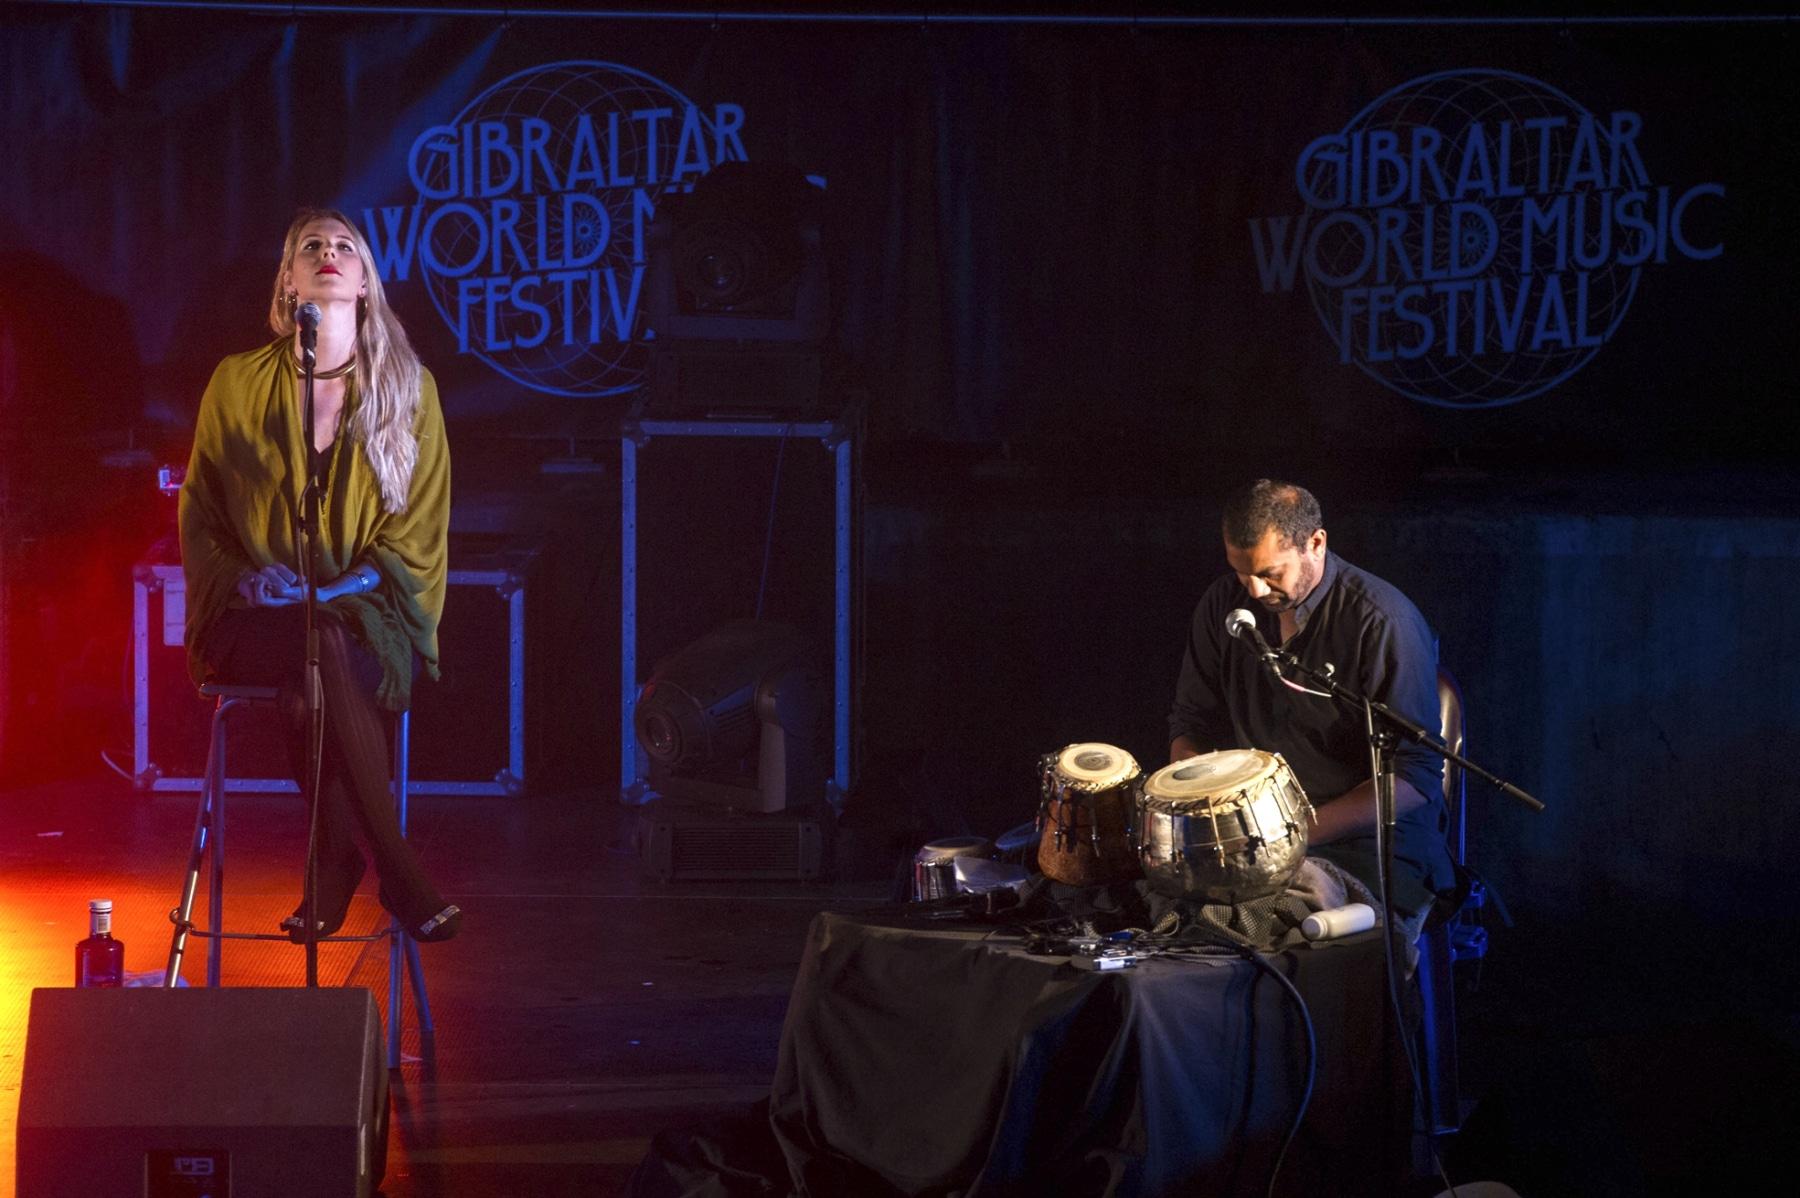 19-mayo-gibraltar-world-music-festival45_14463246224_o